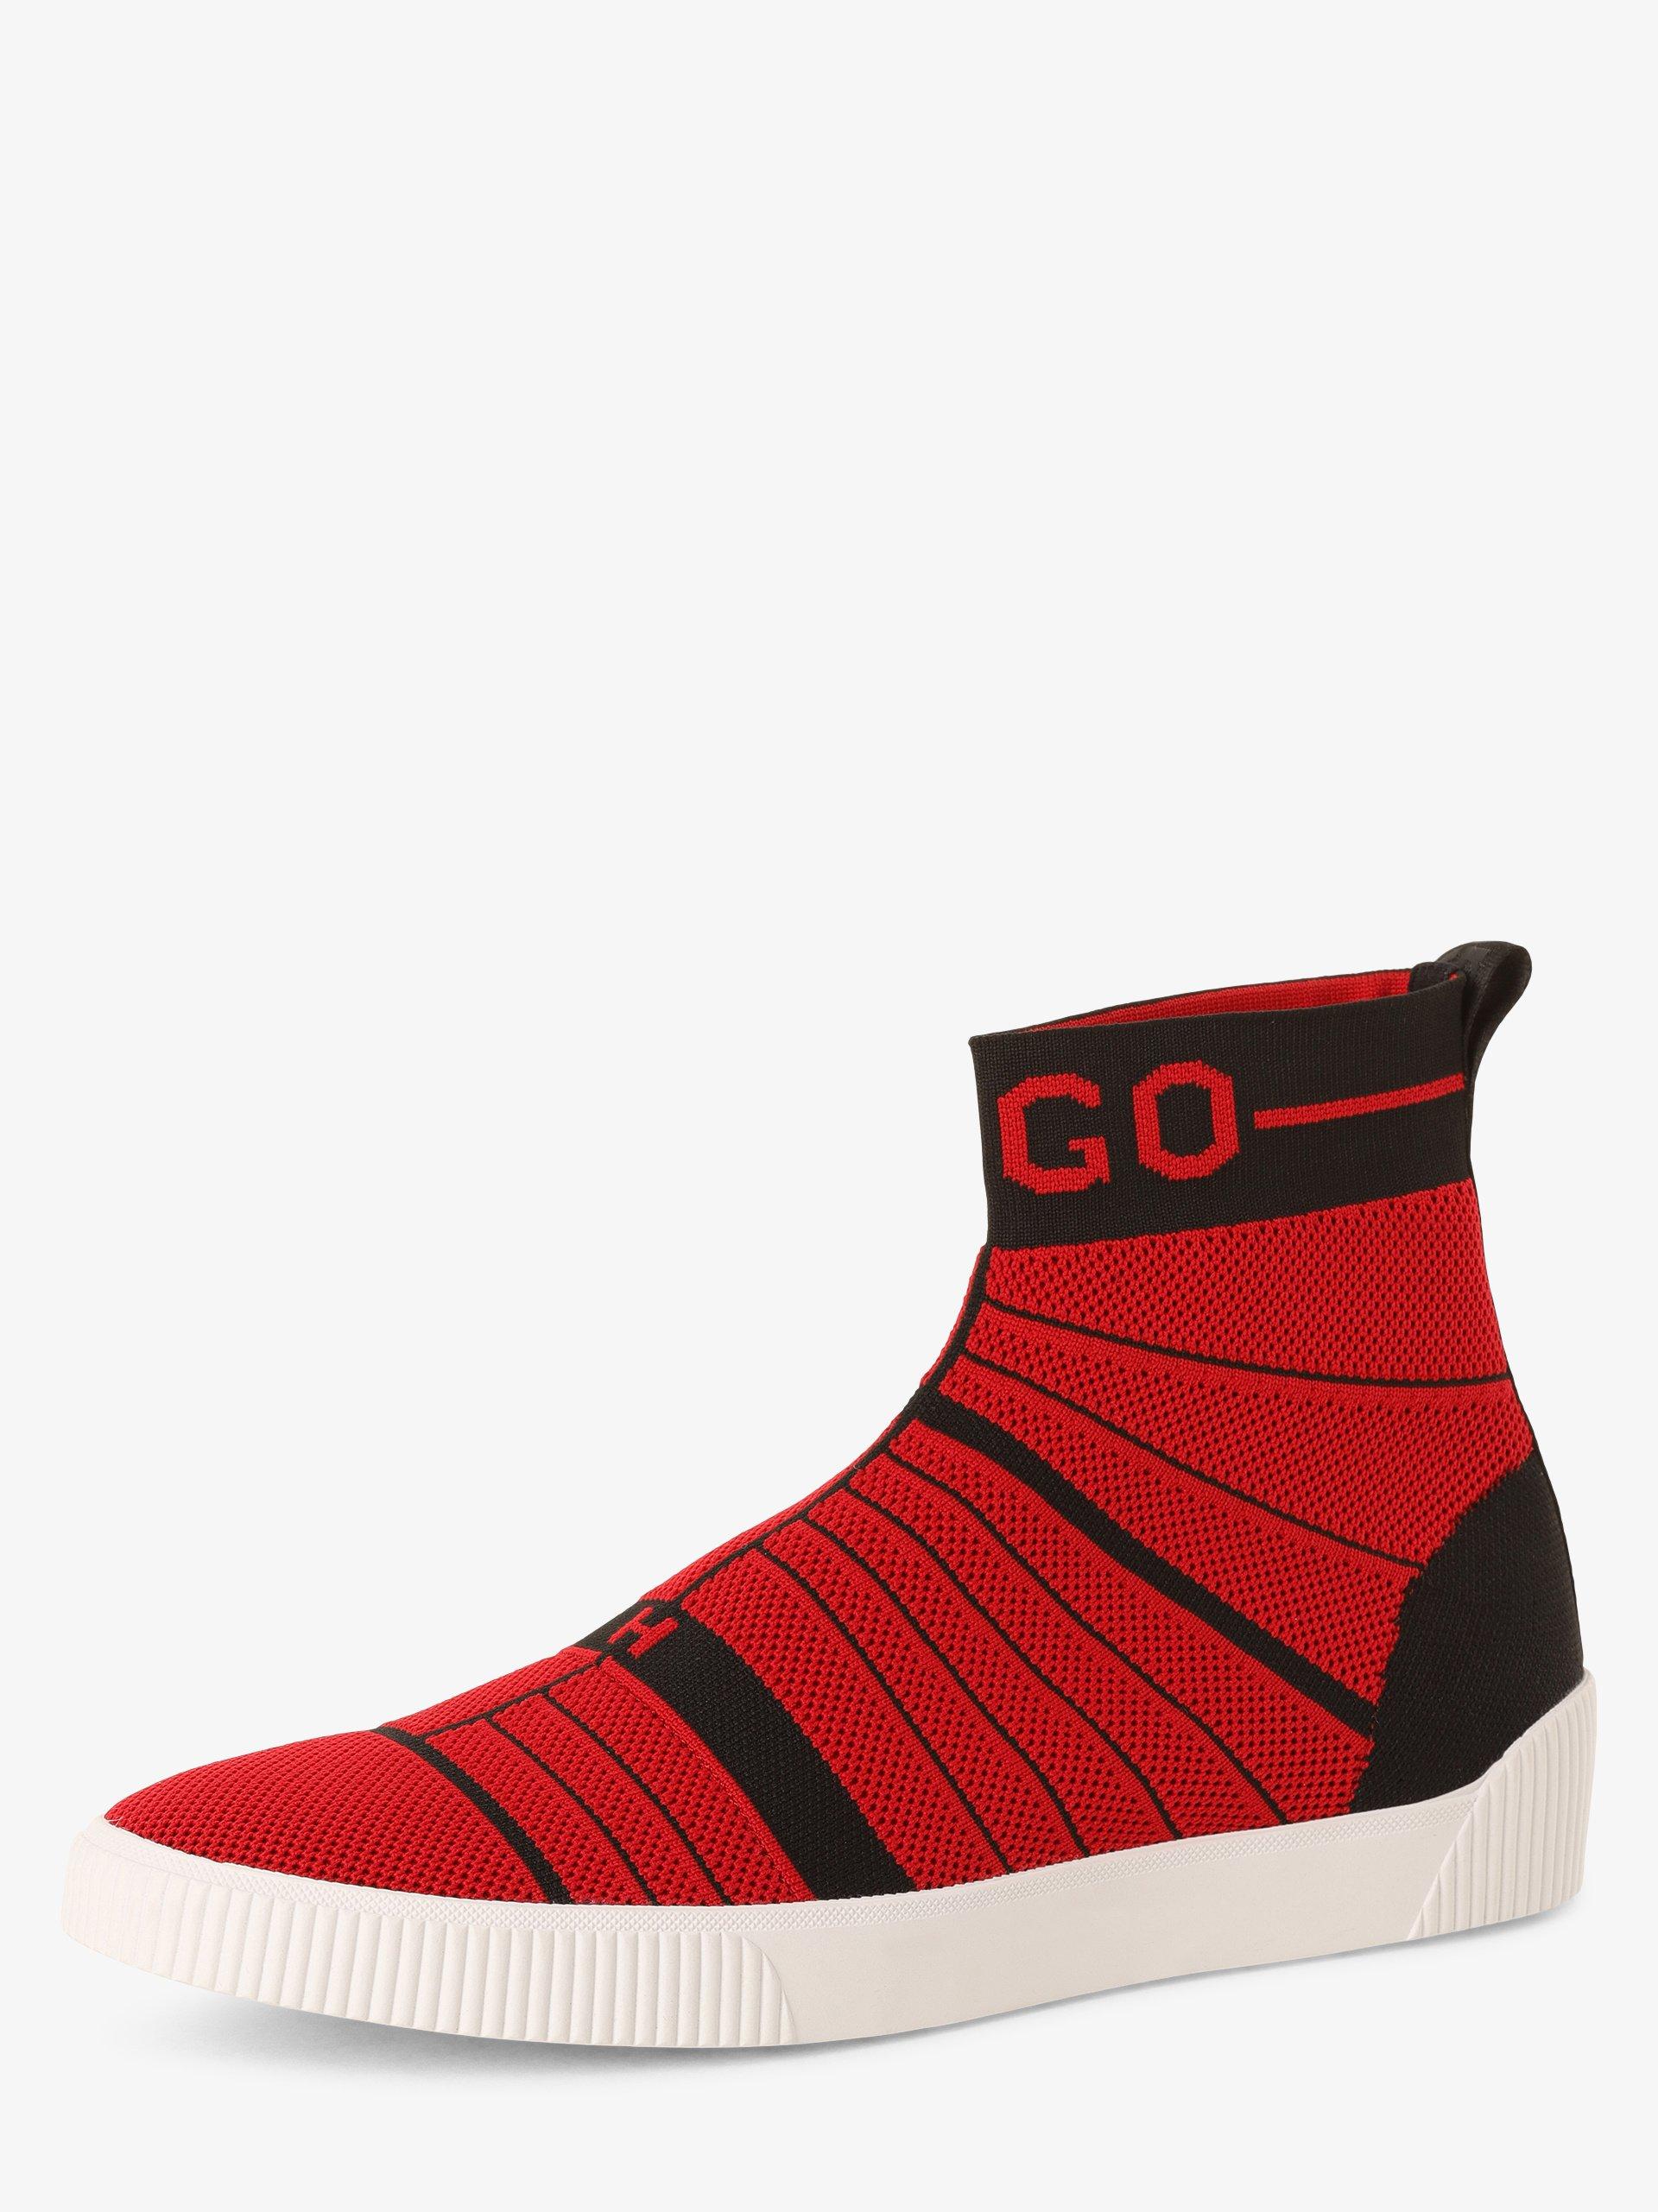 HUGO Herren Sneaker - Zero_Hito_knlab